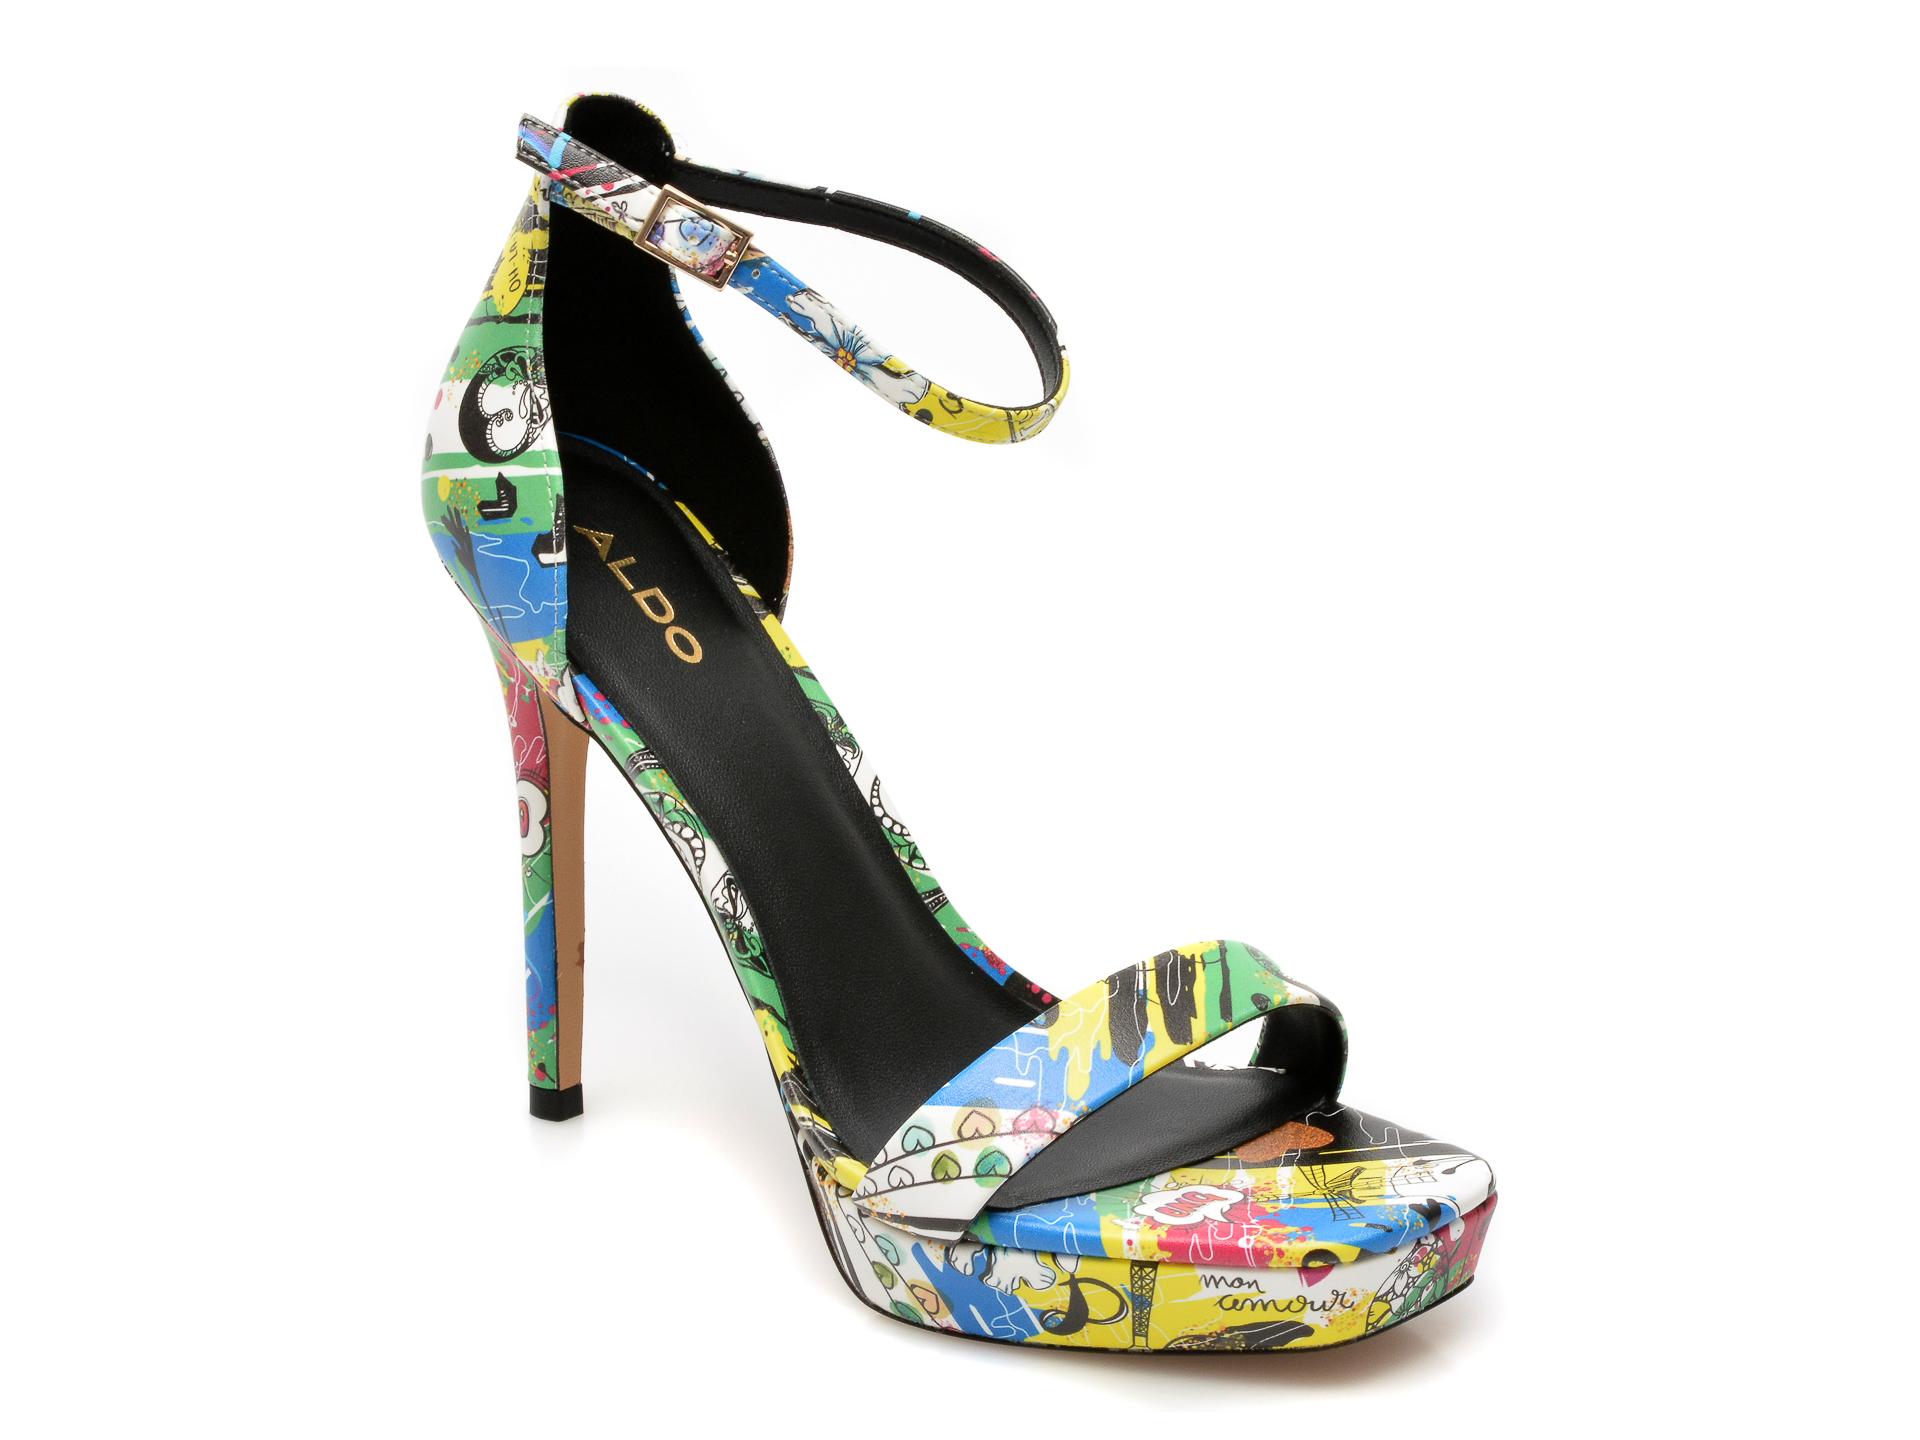 Sandale ALDO multicolore, Scarlett960, din piele ecologica imagine otter.ro